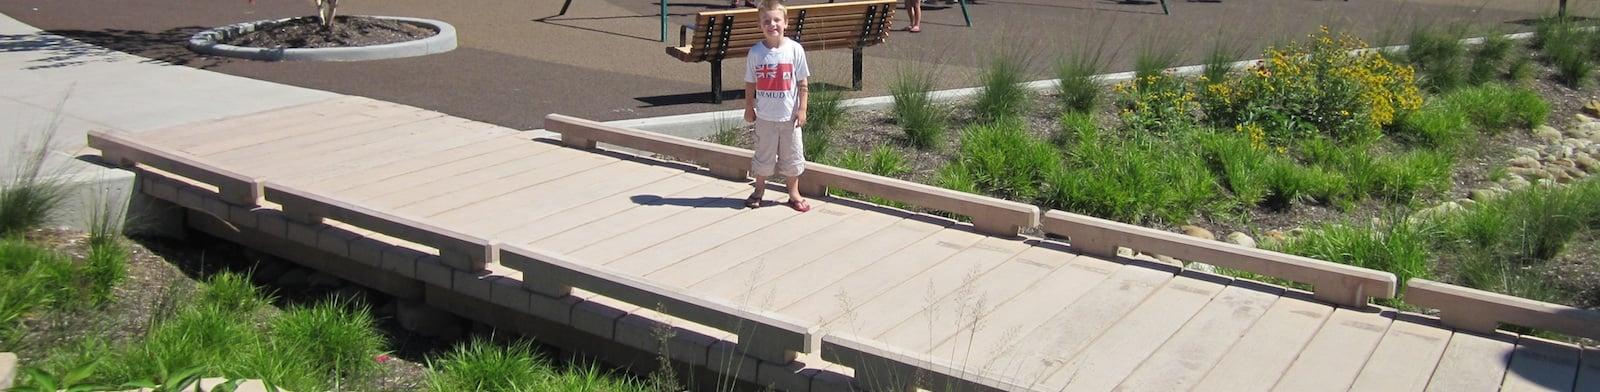 cleveland_ohio_concrete_boardwalk.jpg